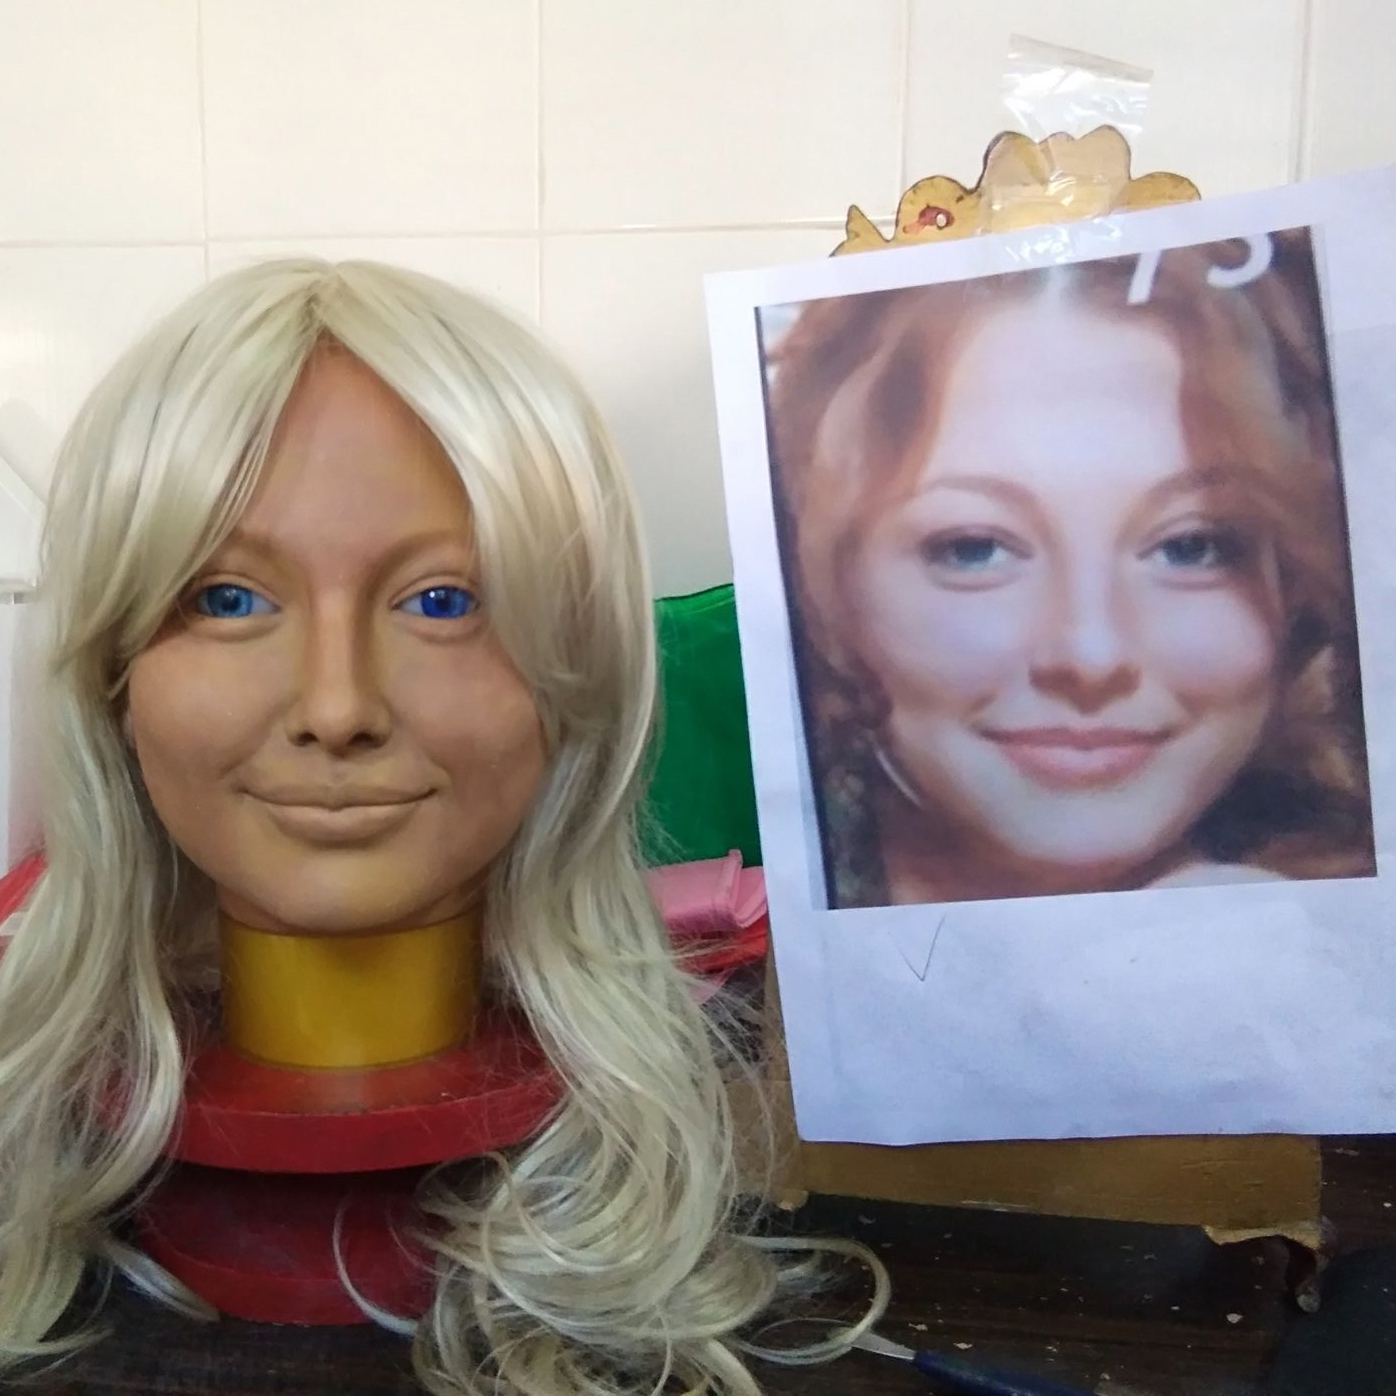 Ailijia realist sex doll head customized doll head for man with oral sexAilijia realist sex doll head customized doll head for man with oral sex